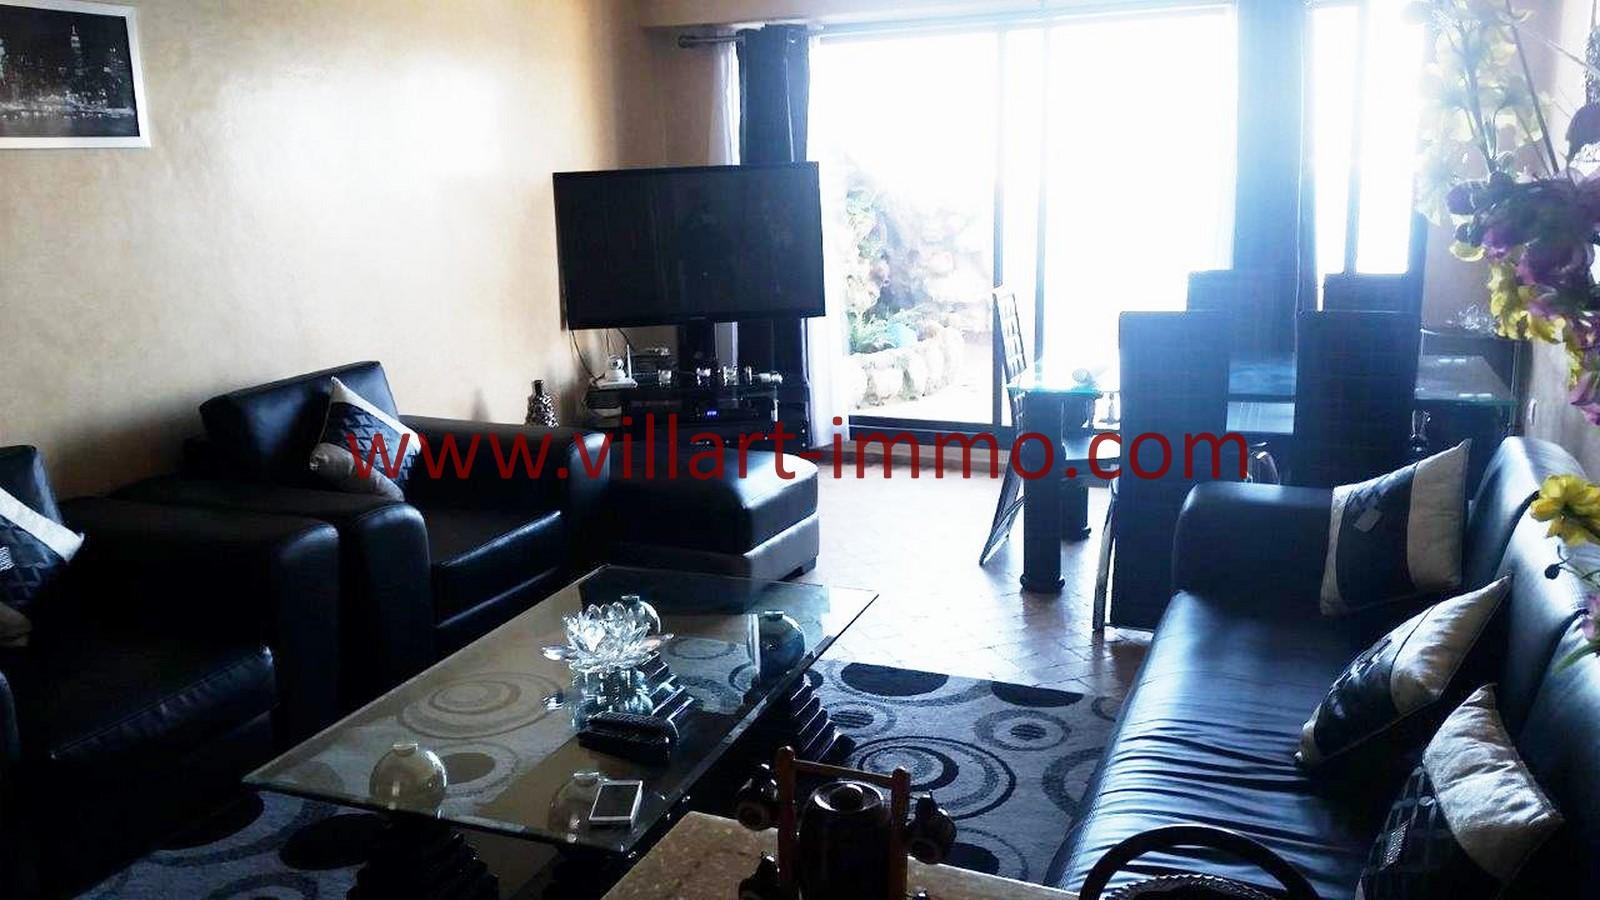 1 Location Tanger Playa Appartement Meublé Salon 1 L1016 ...